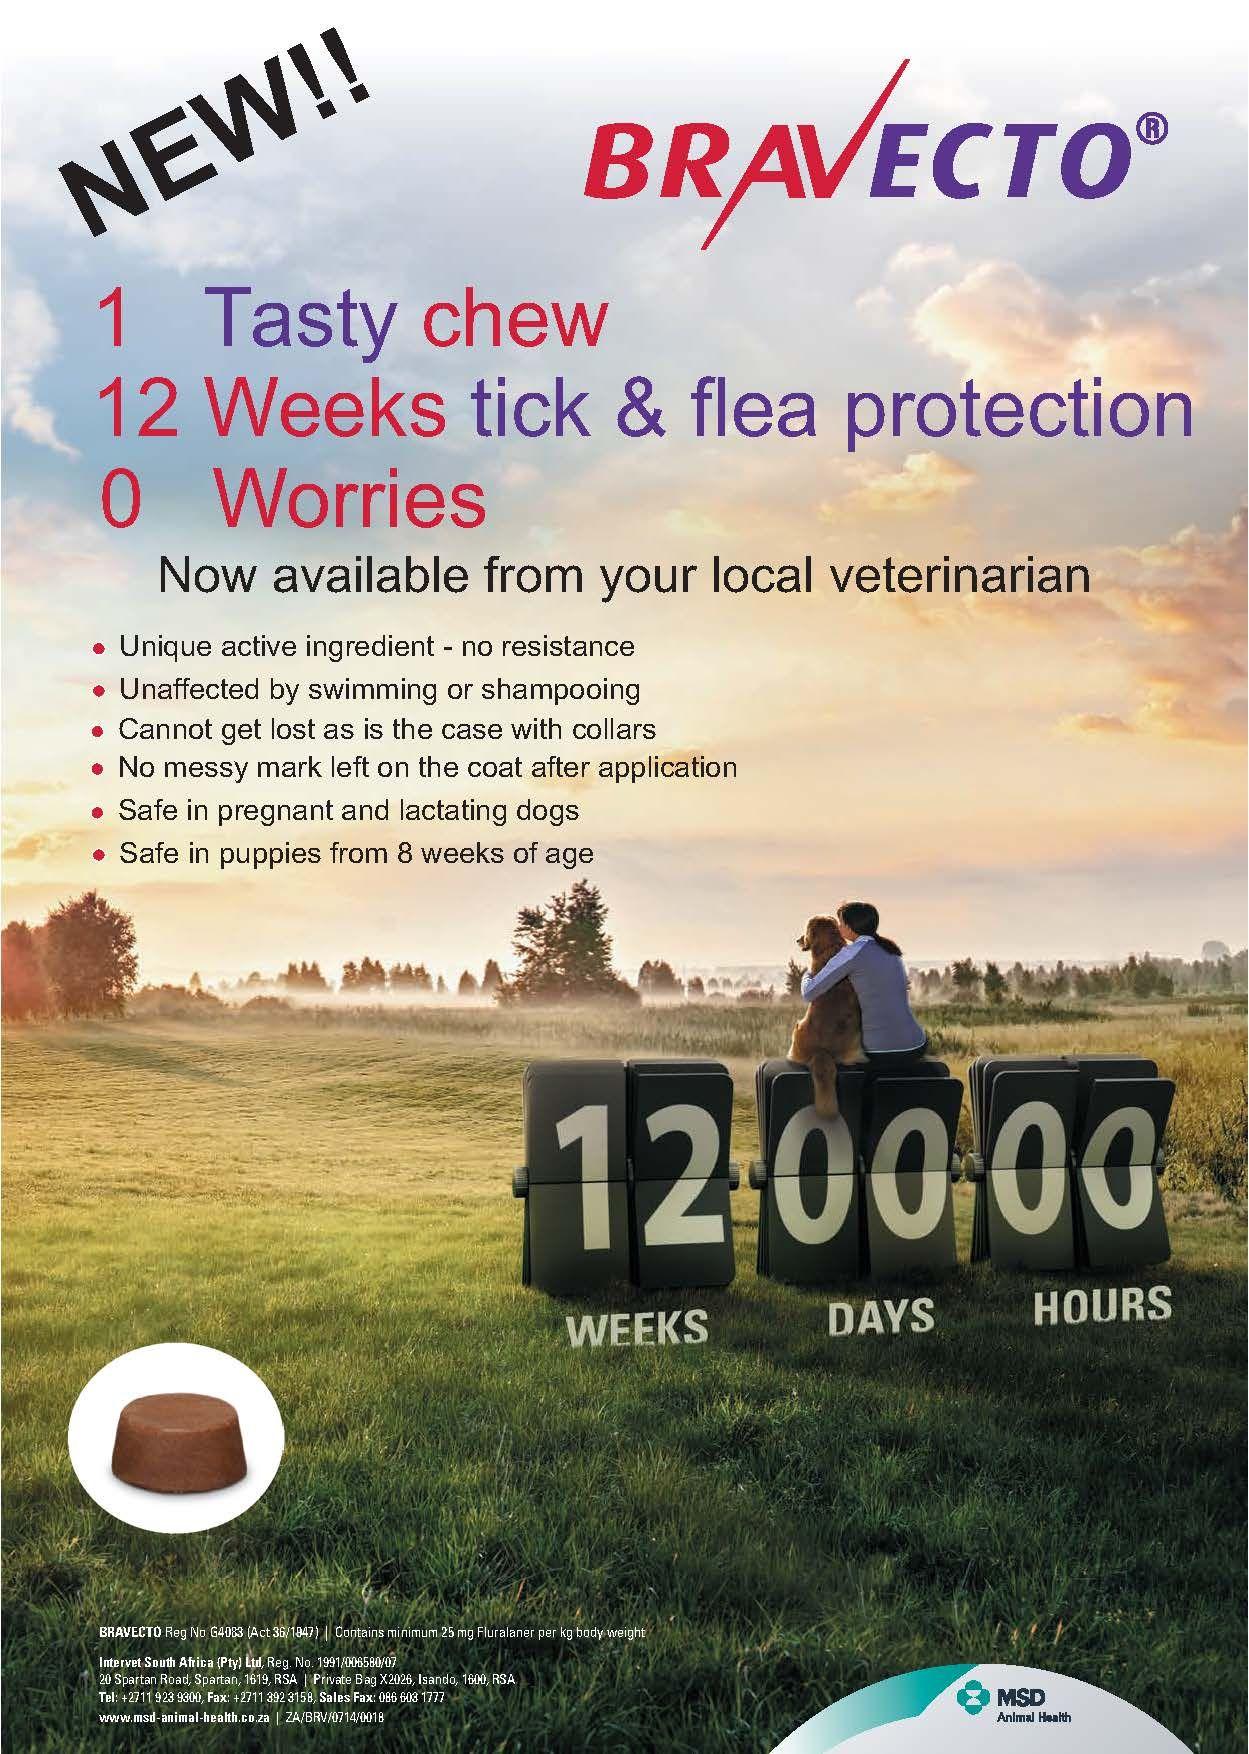 graphic regarding Bravecto Printable Coupons identified as bravecto poster Merchandise Fleas, Animals, Puppies